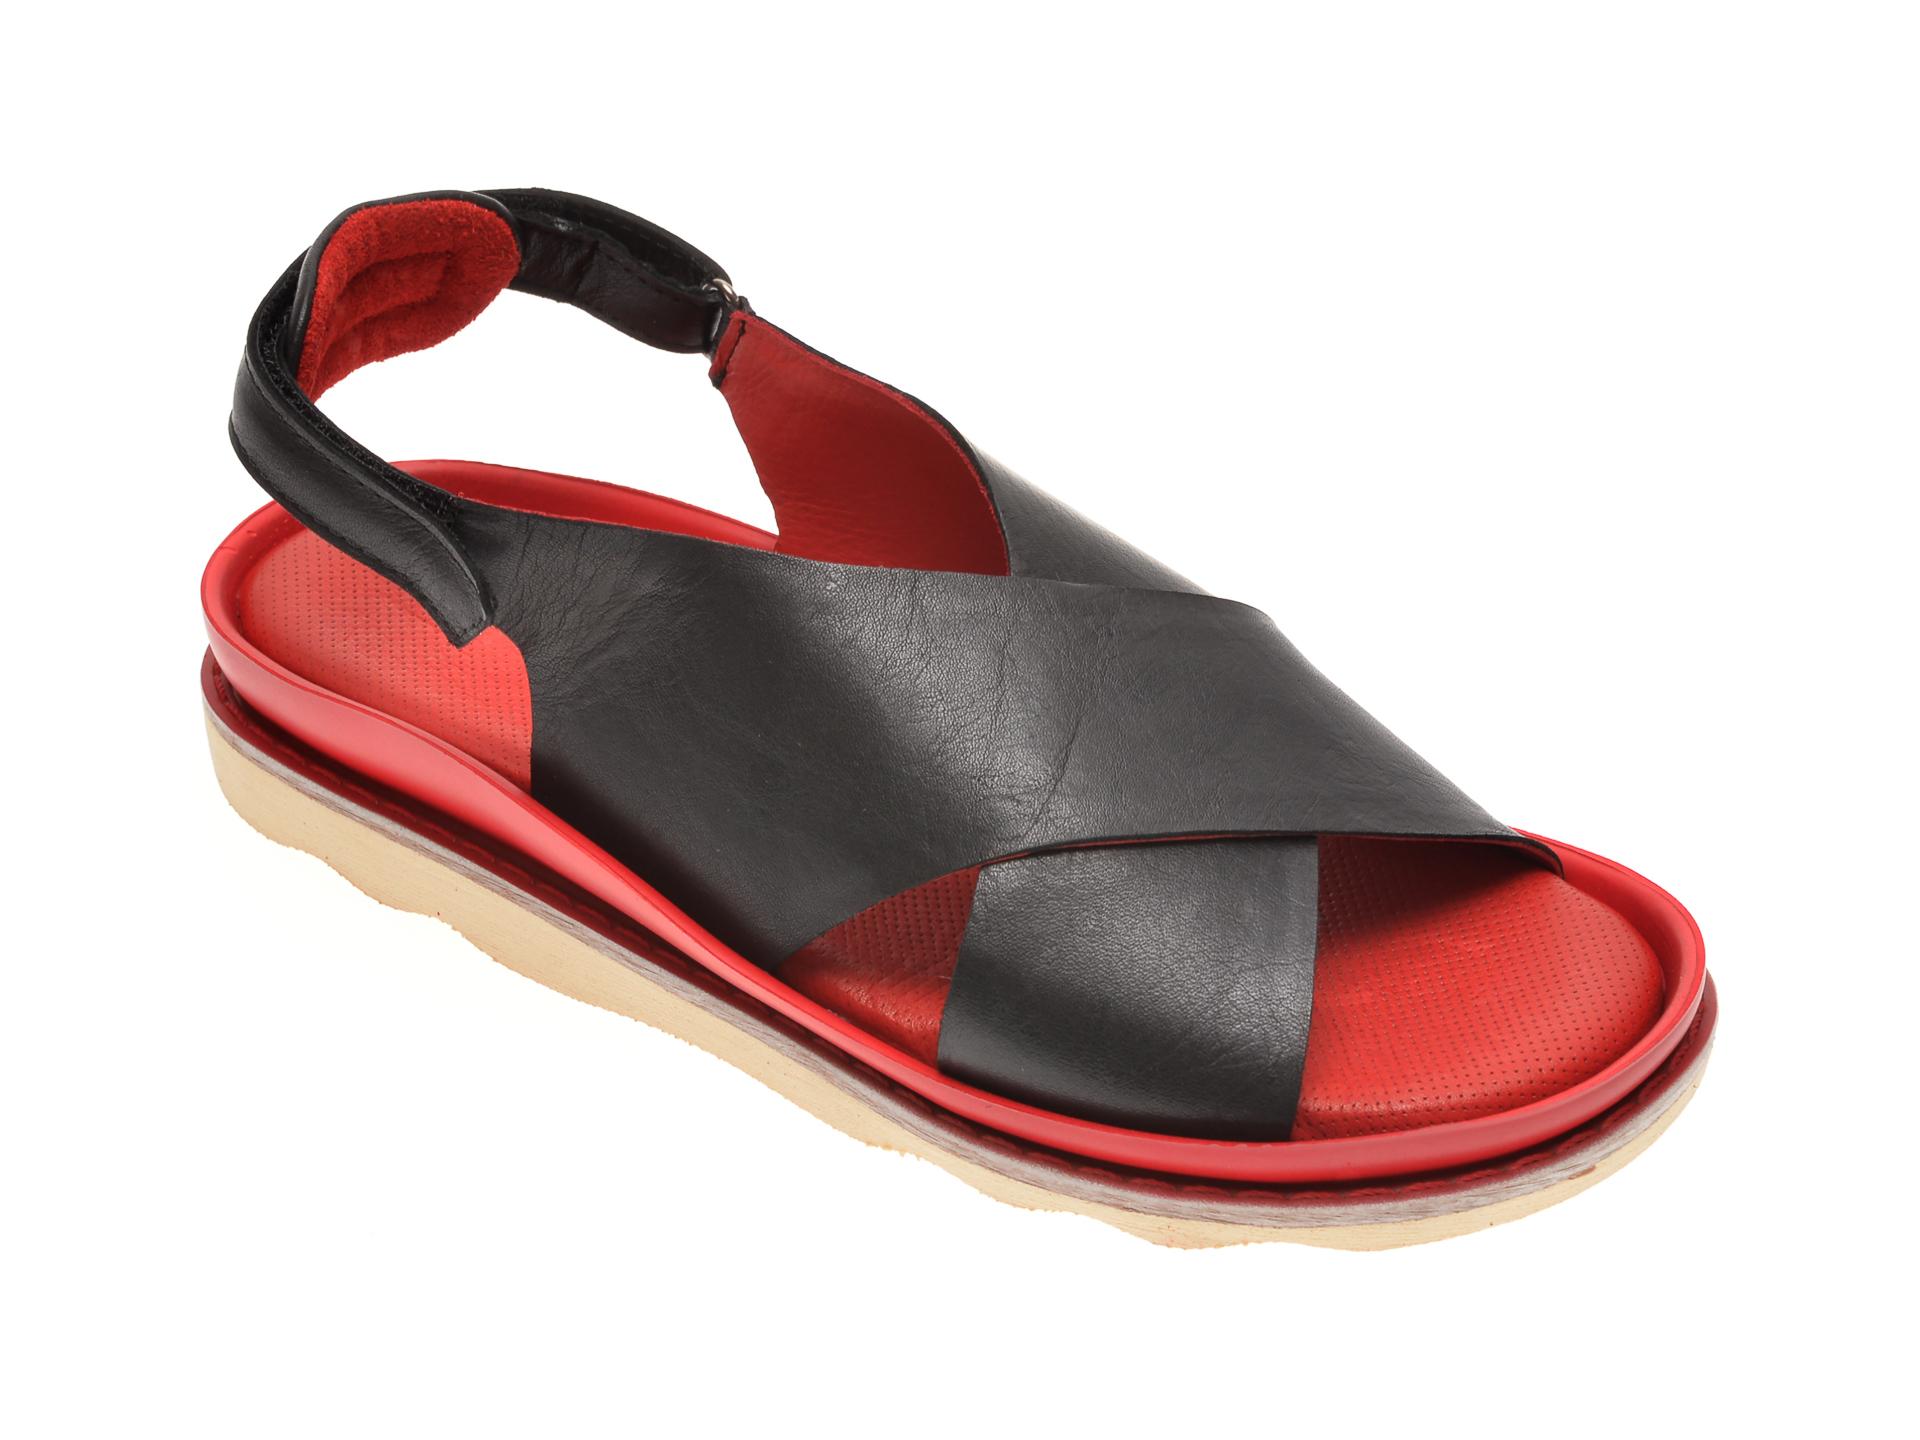 Sandale BABOOS negre, 0403, din piele naturala